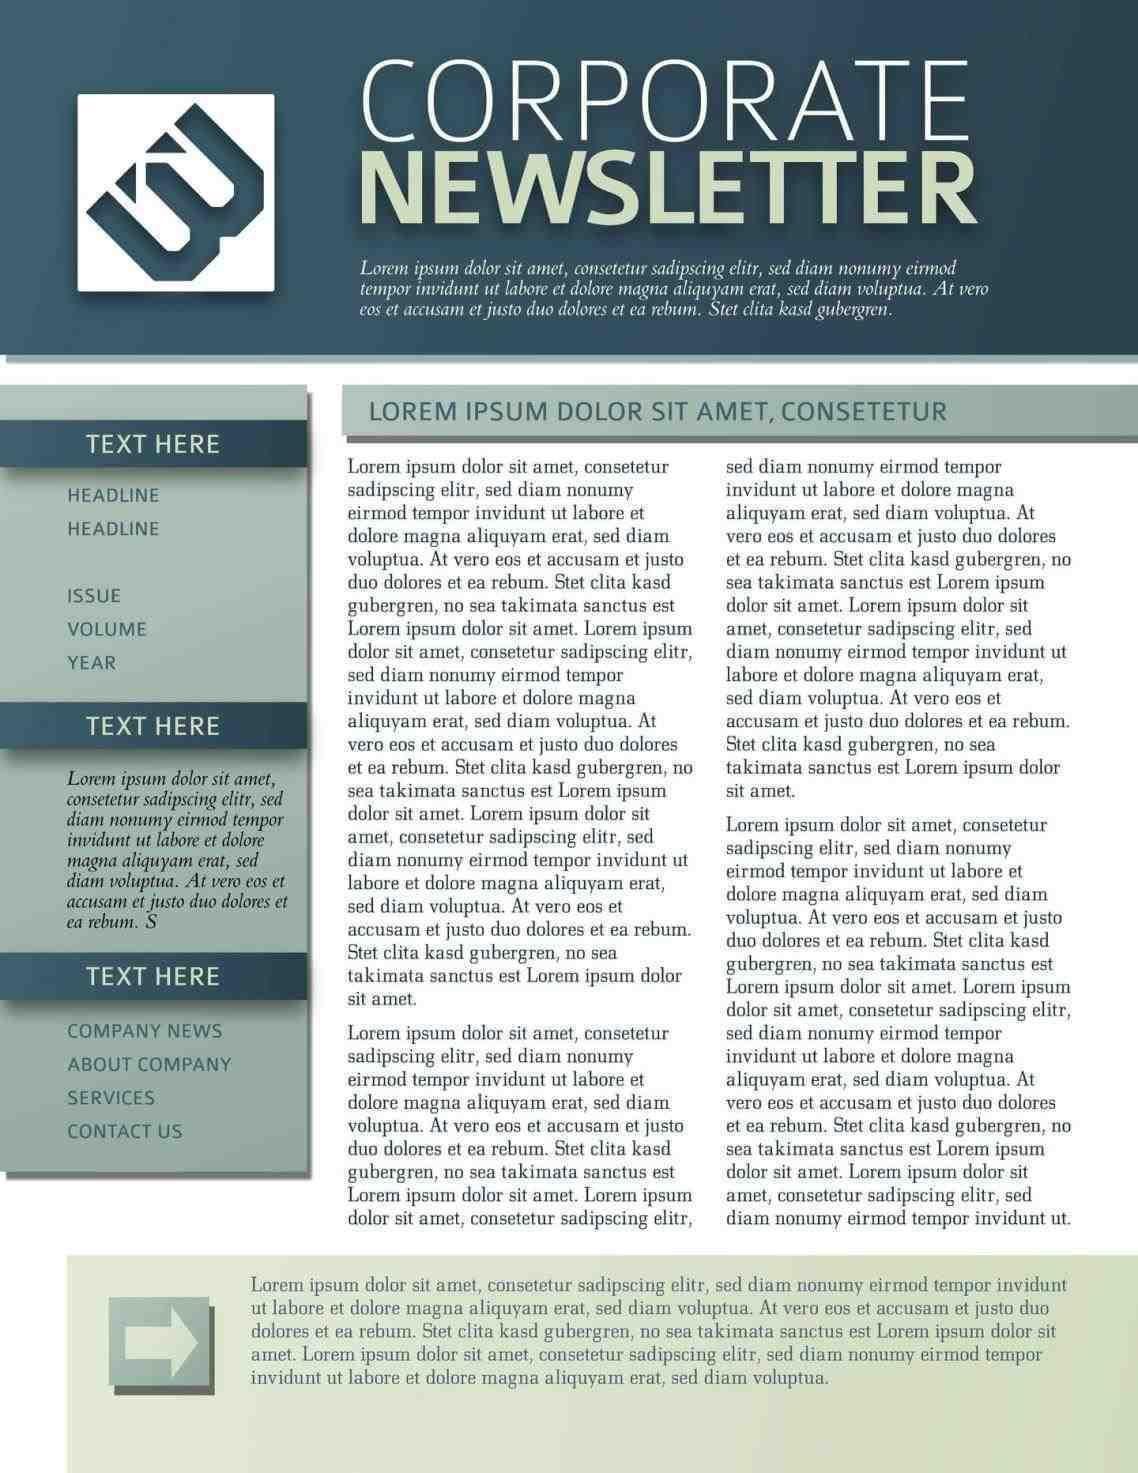 Free Department Newsletter Templates Newsletter Templates Free Monthly Calendar Template For Church Newsletter